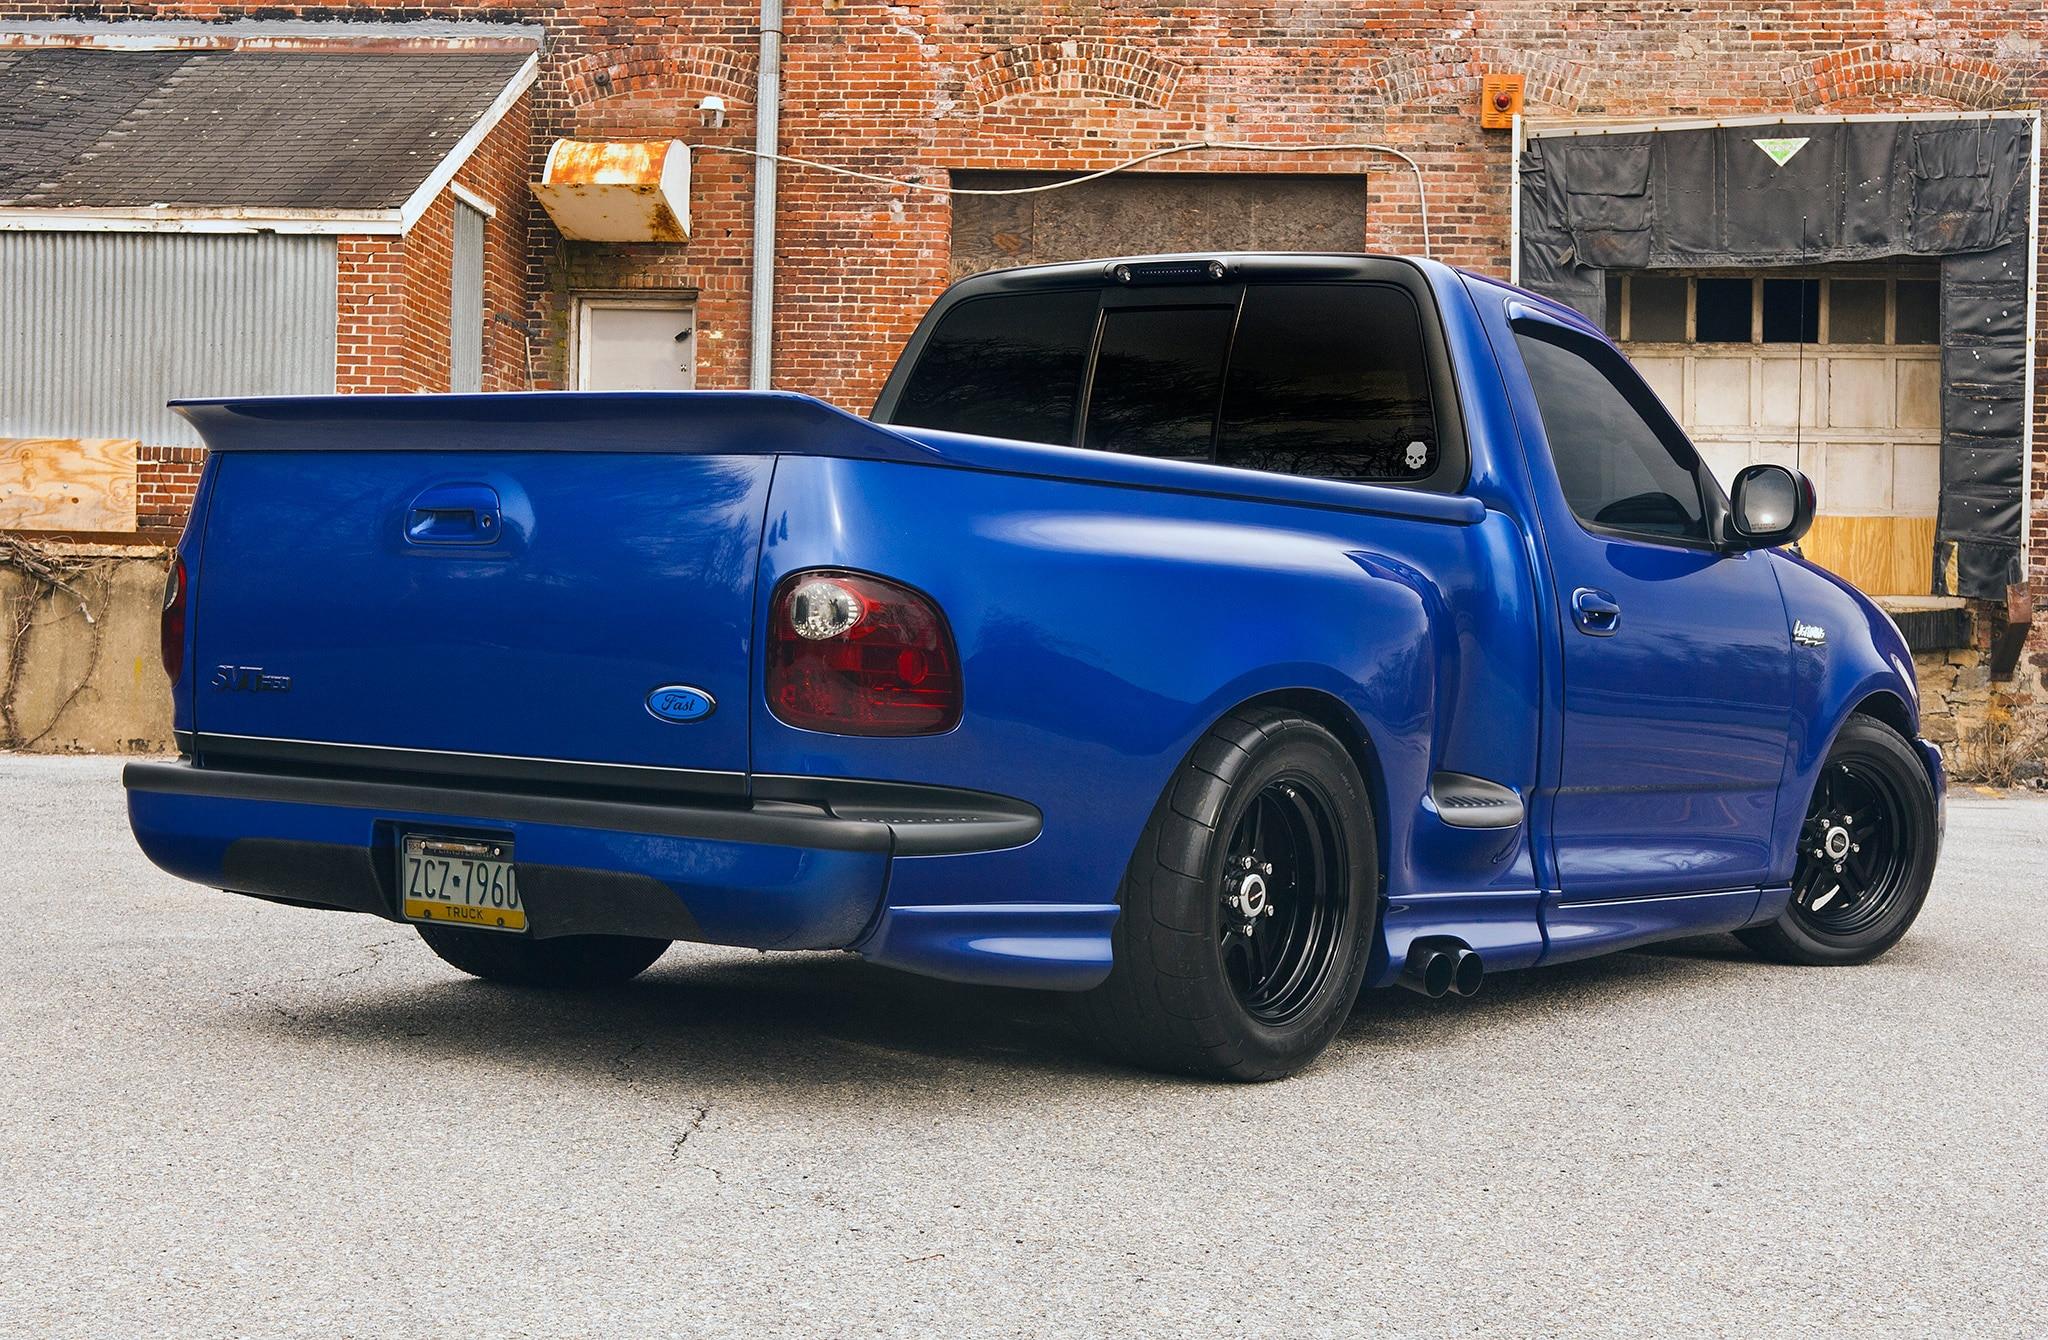 2003 Ford F 150 Svt Lightning Blue Rear Quarter